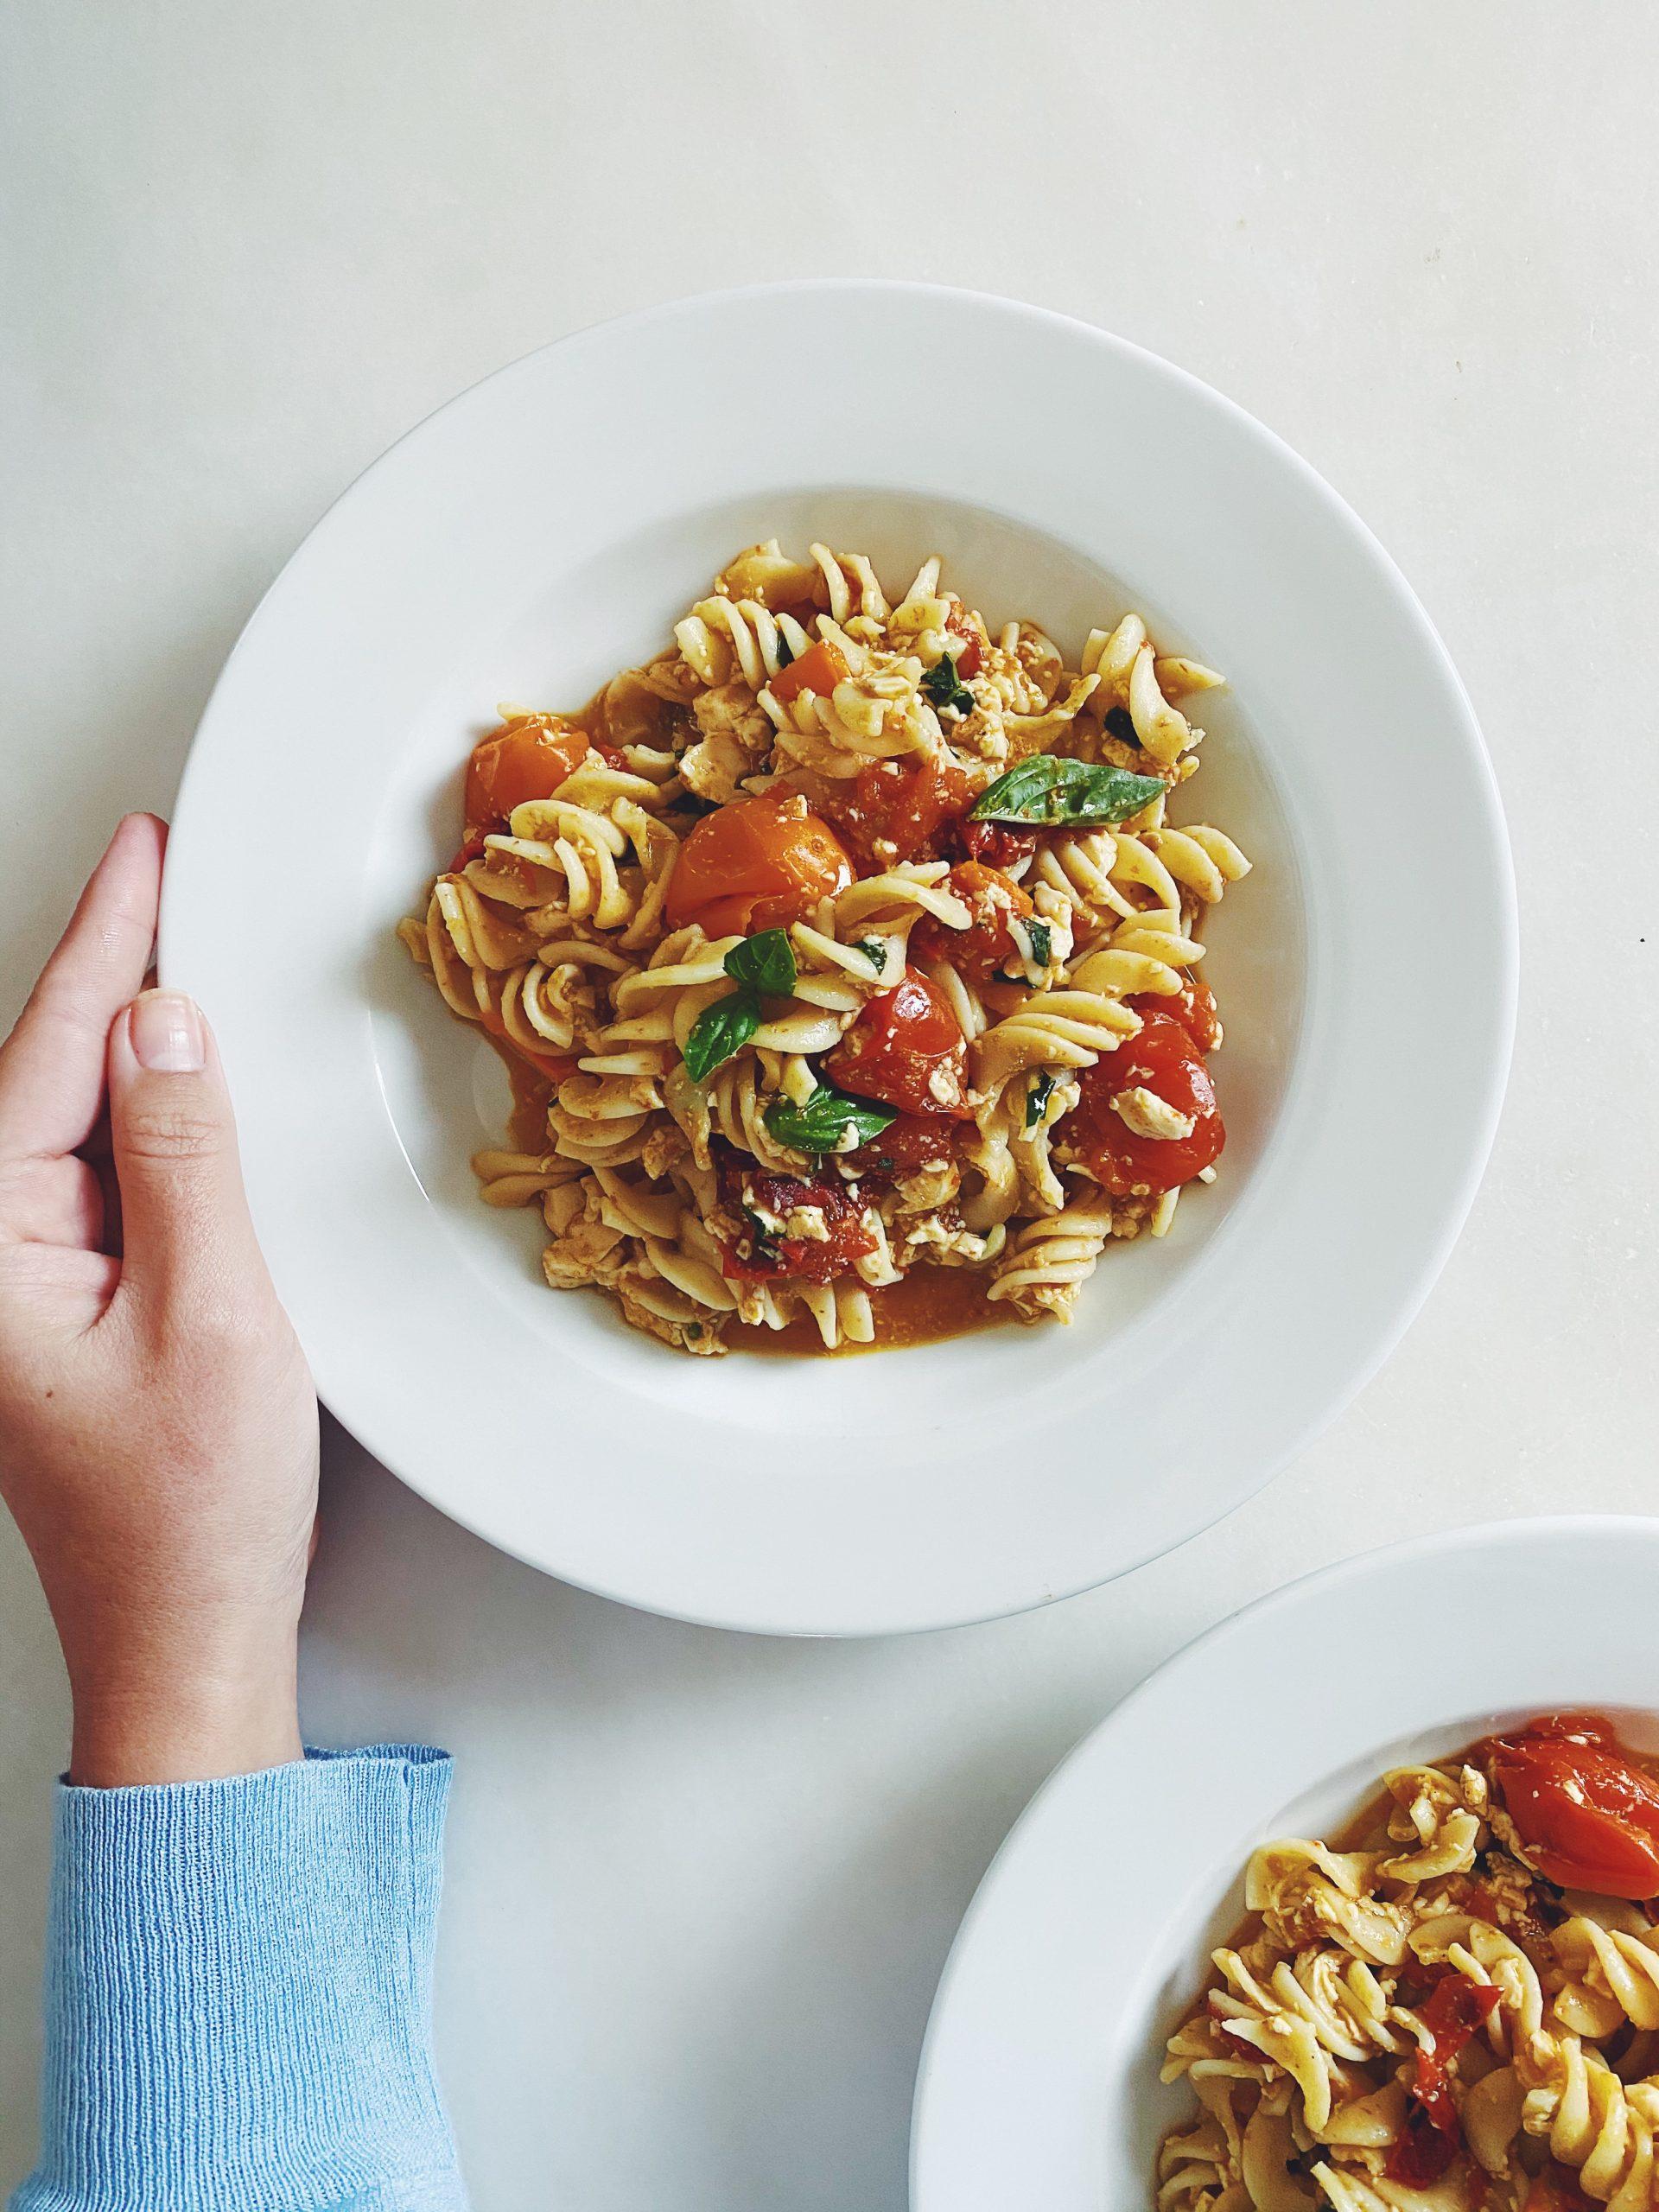 viral vegan feta pasta | please consider | joana limao